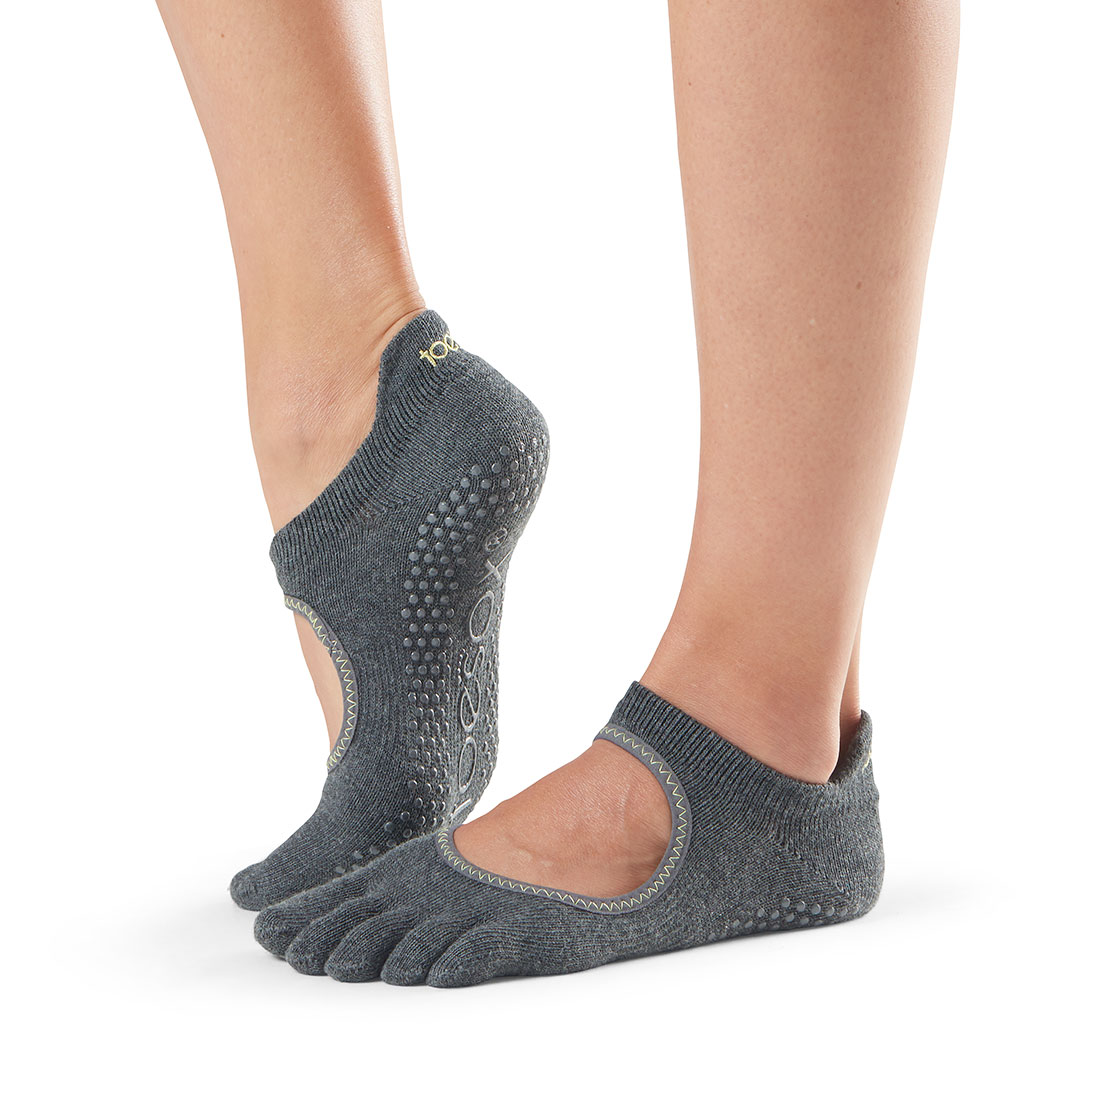 Yogasocken ToeSox Bellarina Full Toe Charcoal Grey w/lime